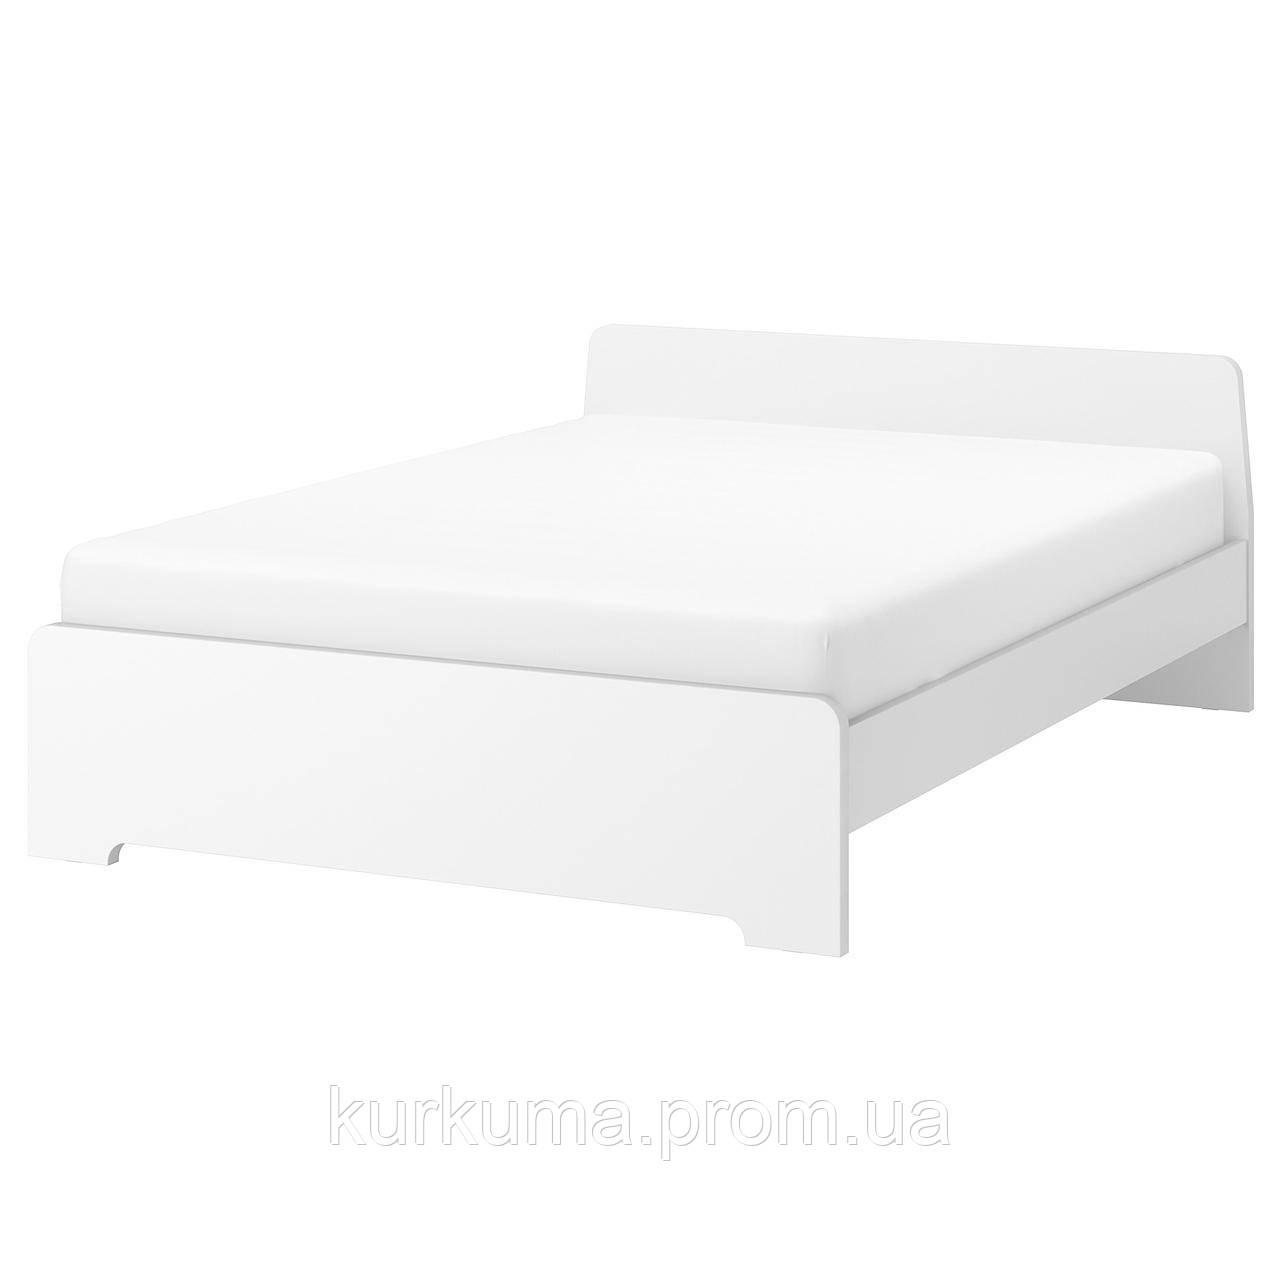 IKEA ASKVOLL Кровать, белый, Лурой  (690.304.72)